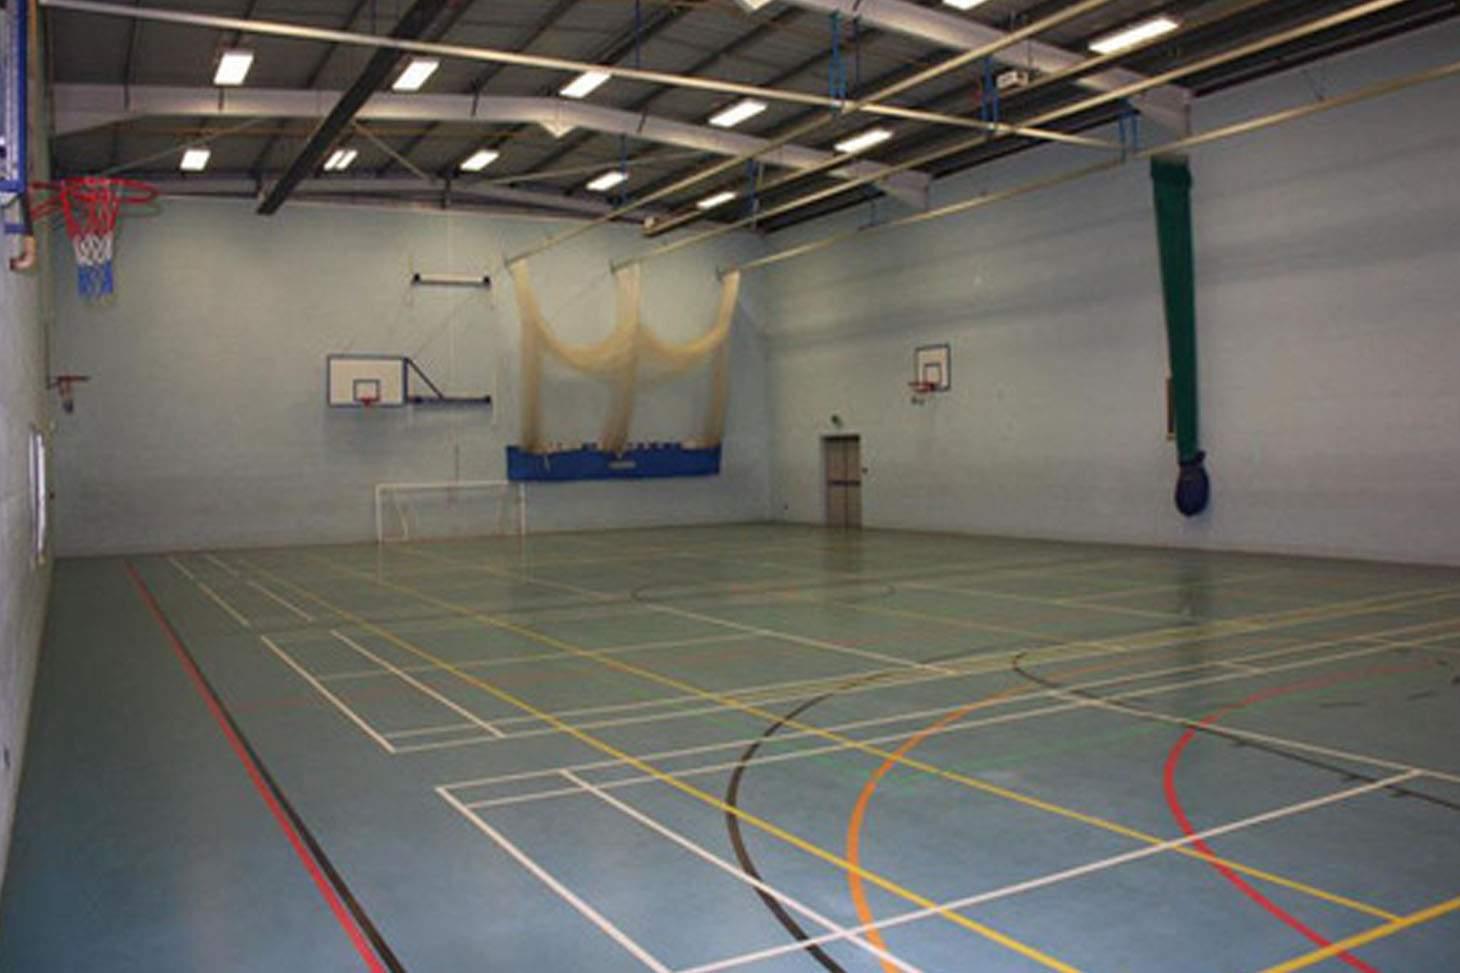 Bishop Rawstorne CE Academy Indoor basketball court